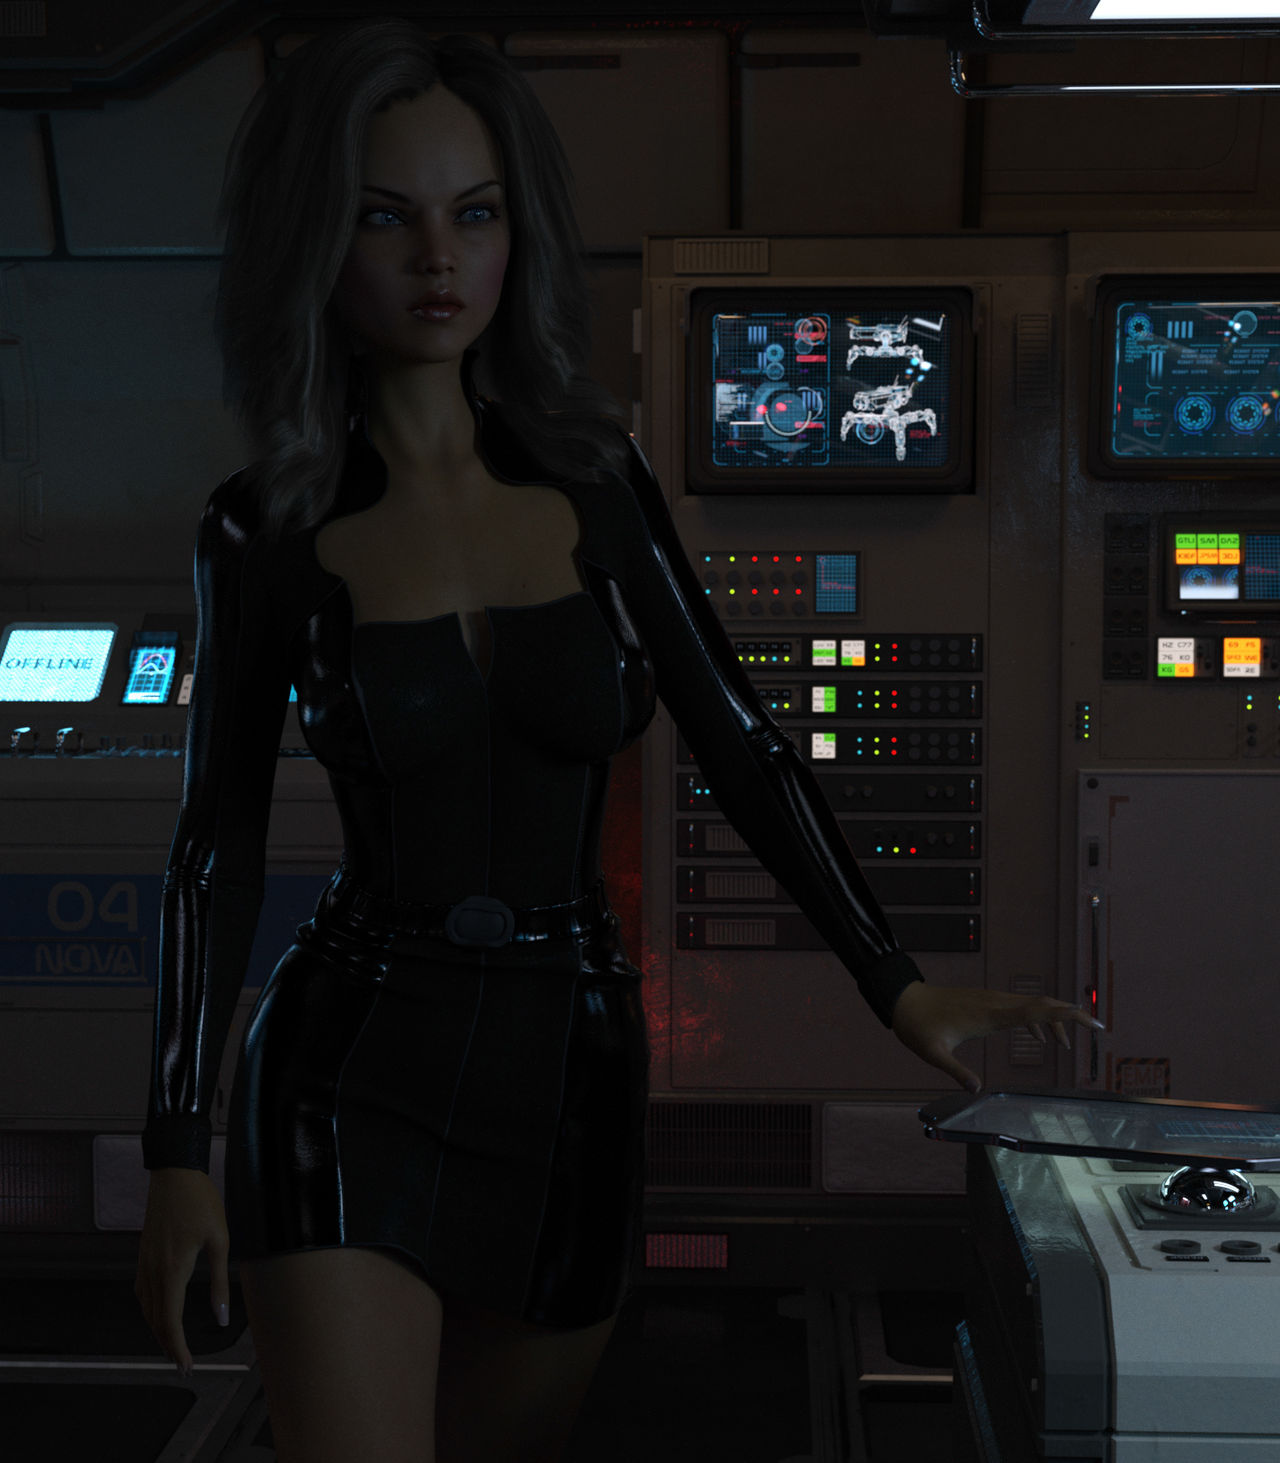 Hình ảnh 007 in Captain Anger